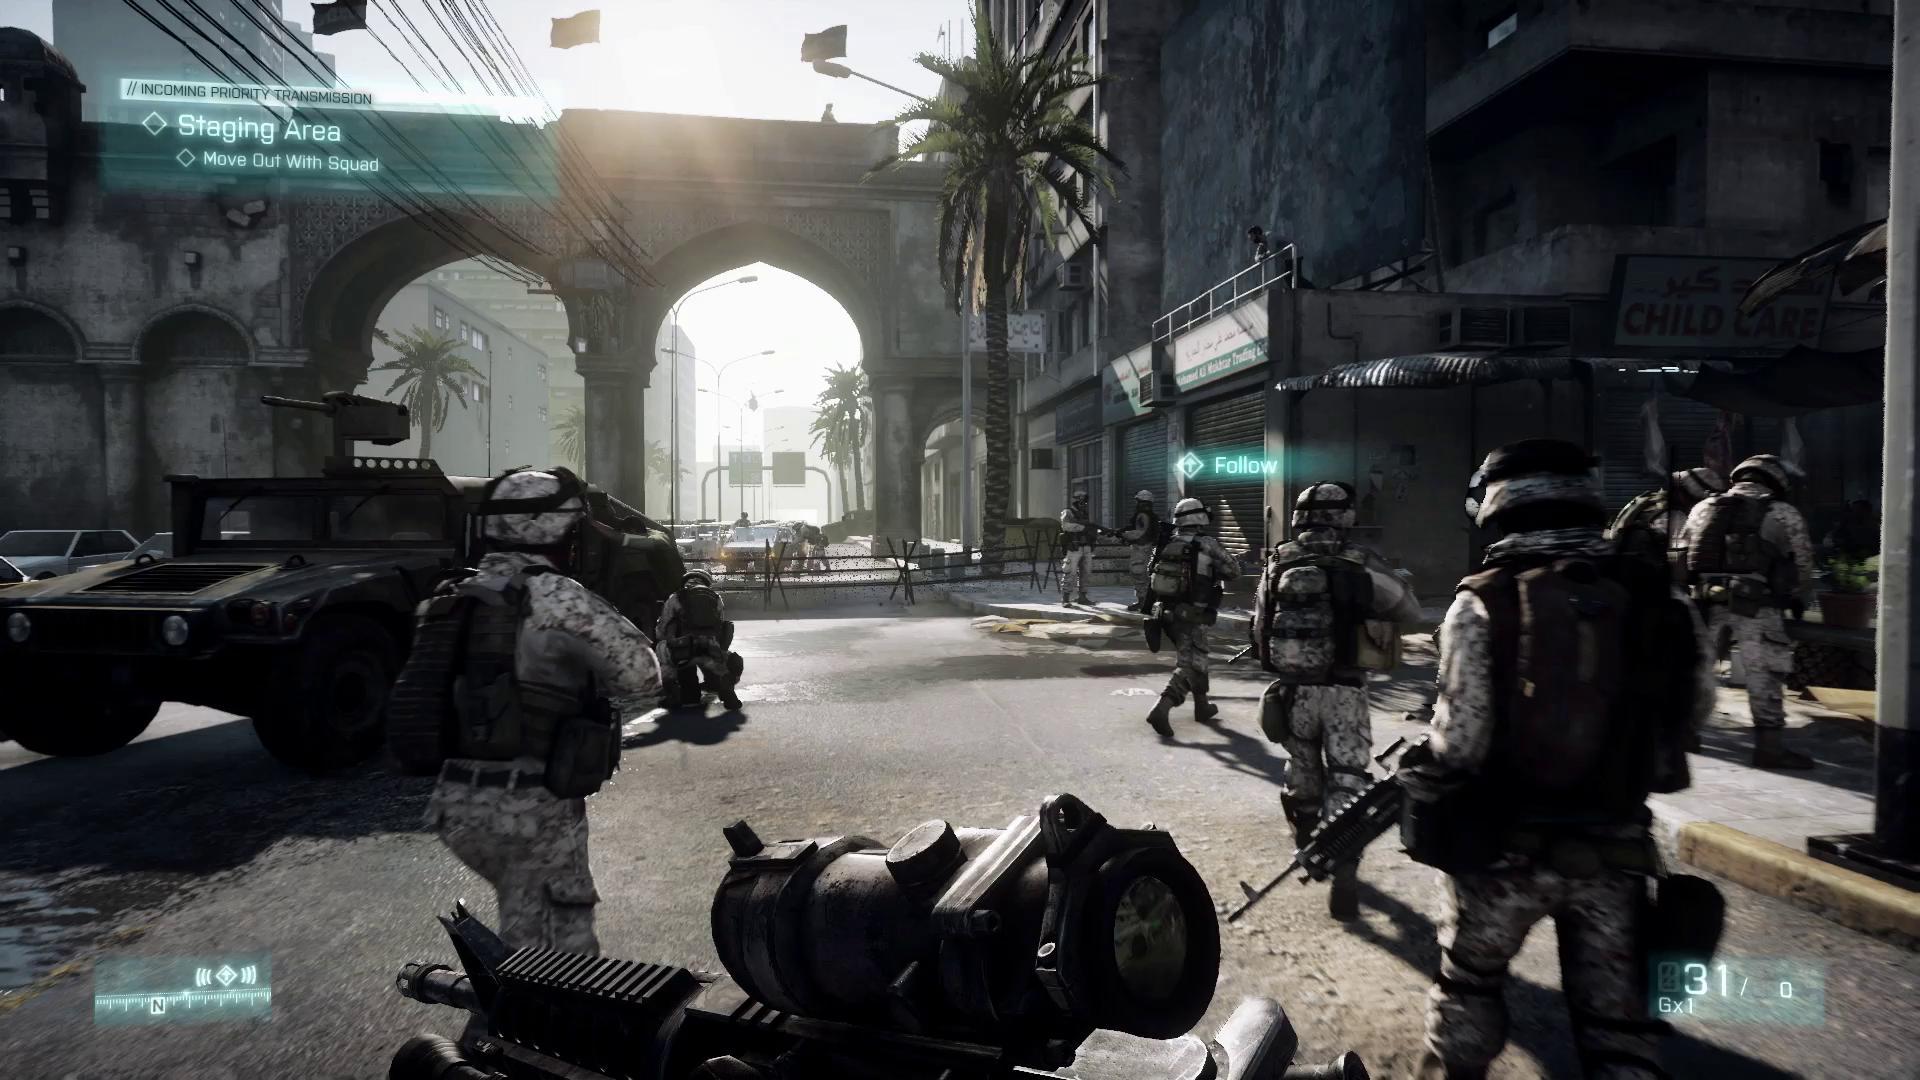 Starcraft Wallpaper Hd Battlefield 3 Media Battlefield 3 Gamereplays Org